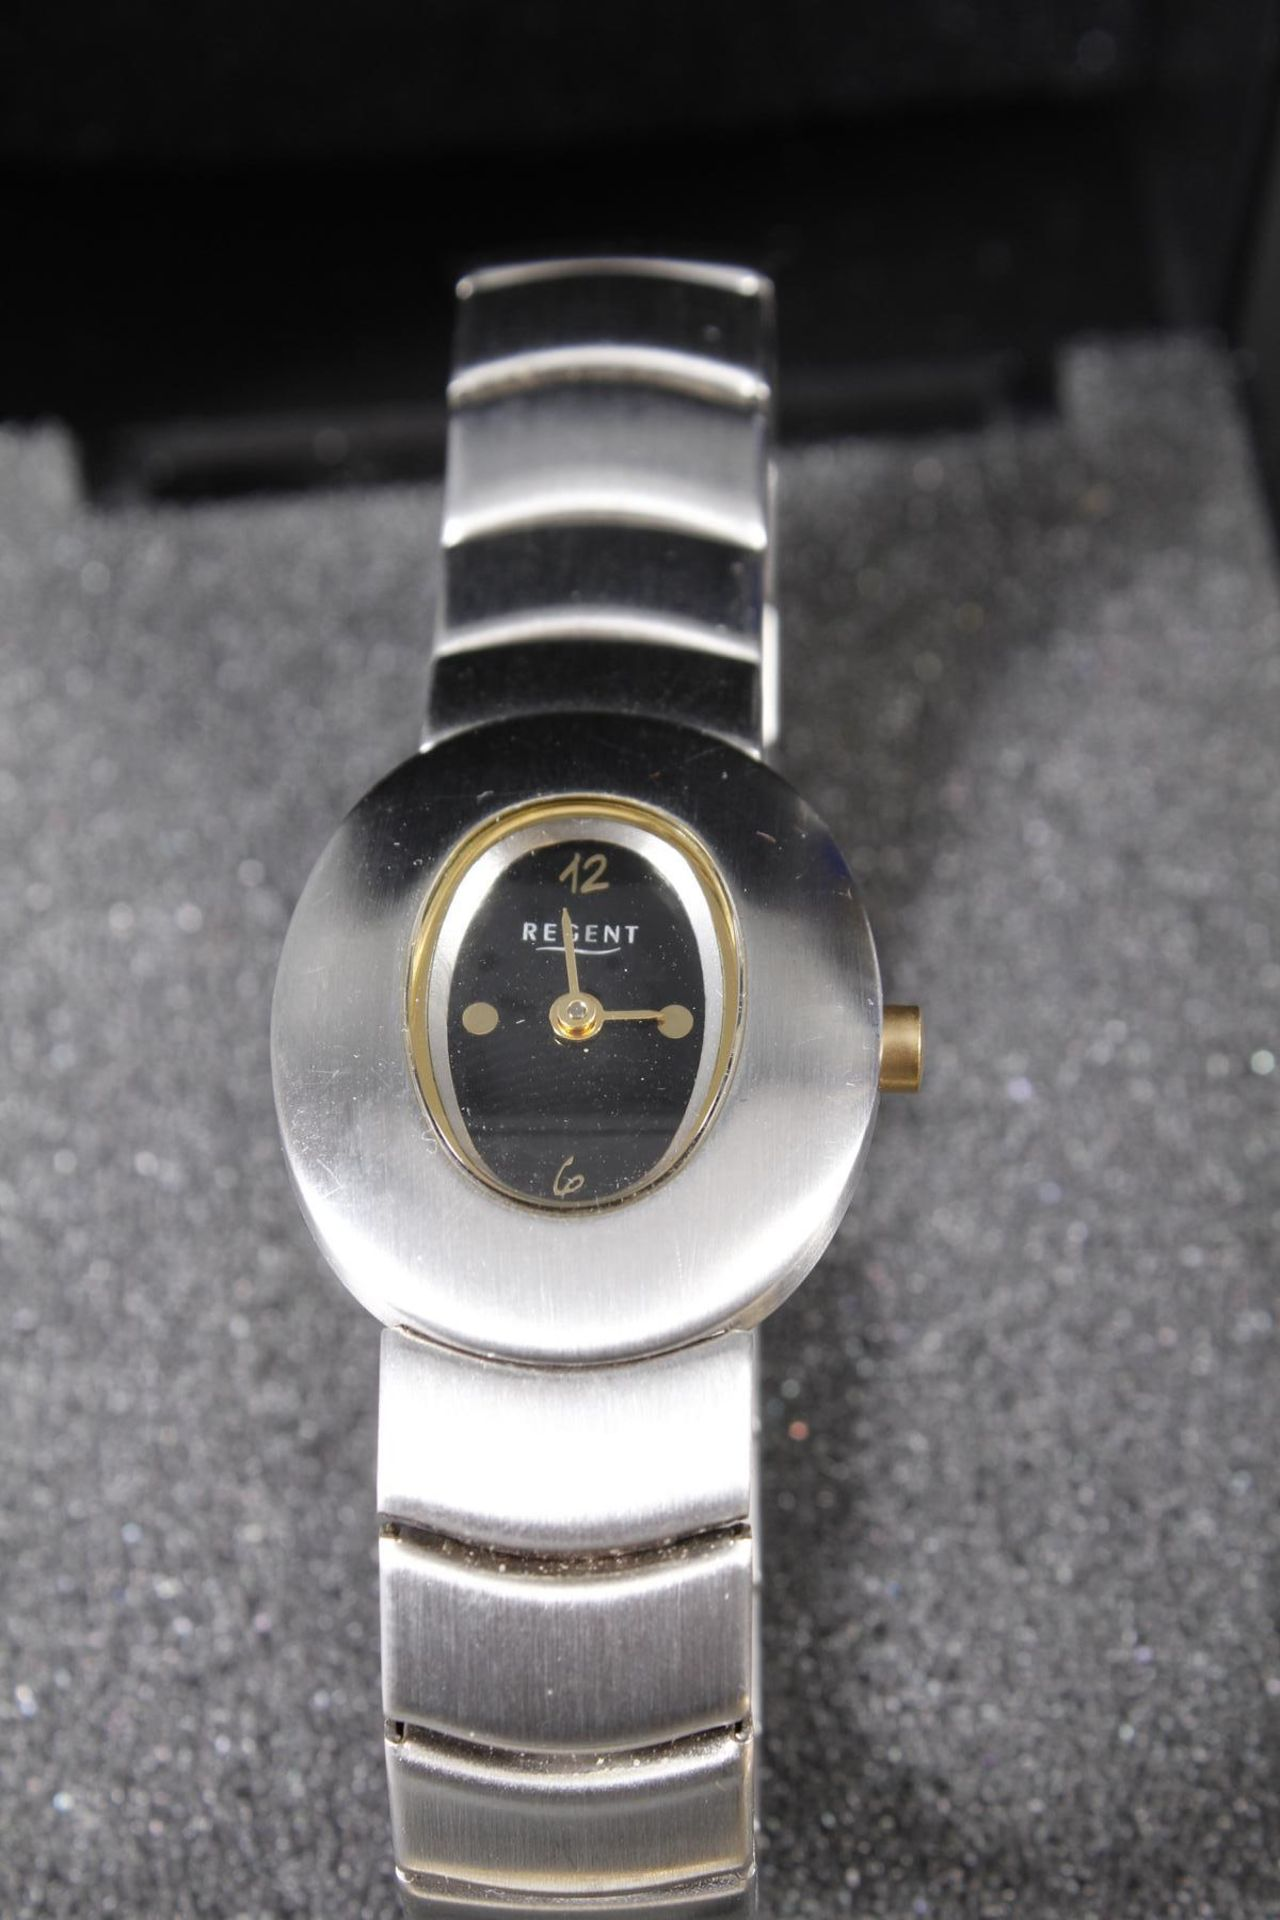 Konvolut Damen und Herrenarmbanduhren, 14 Stück - Bild 7 aus 7